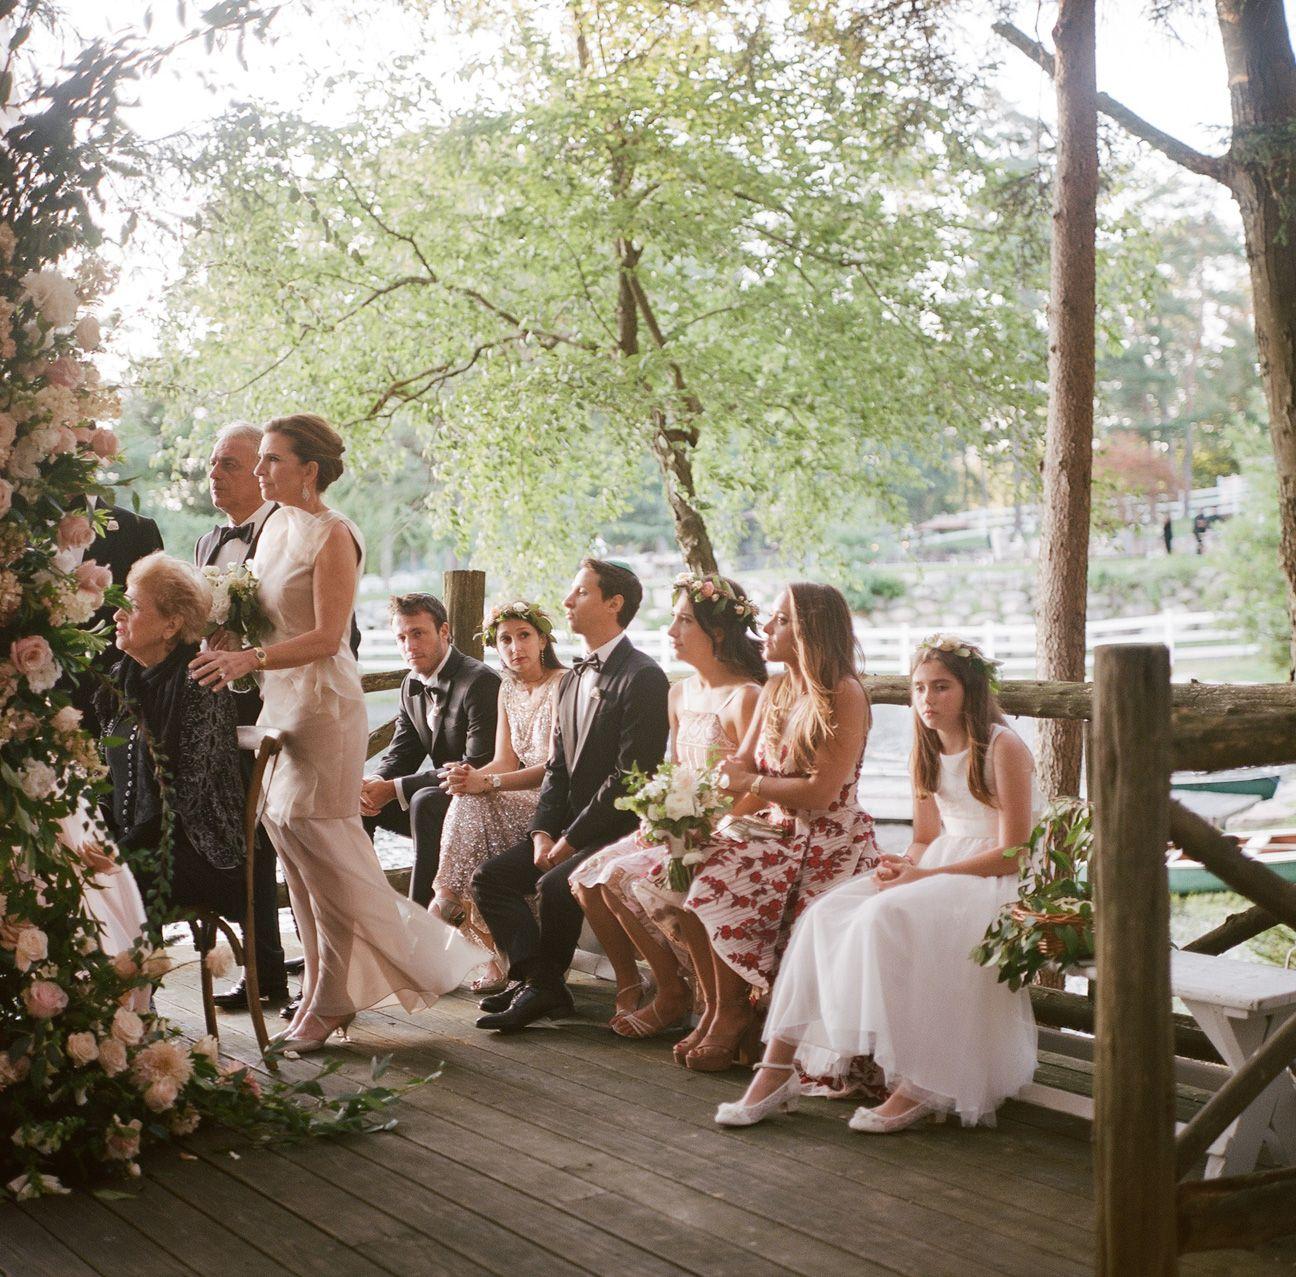 KarenHillPhotography-Parizat-Wedding-0589.jpg